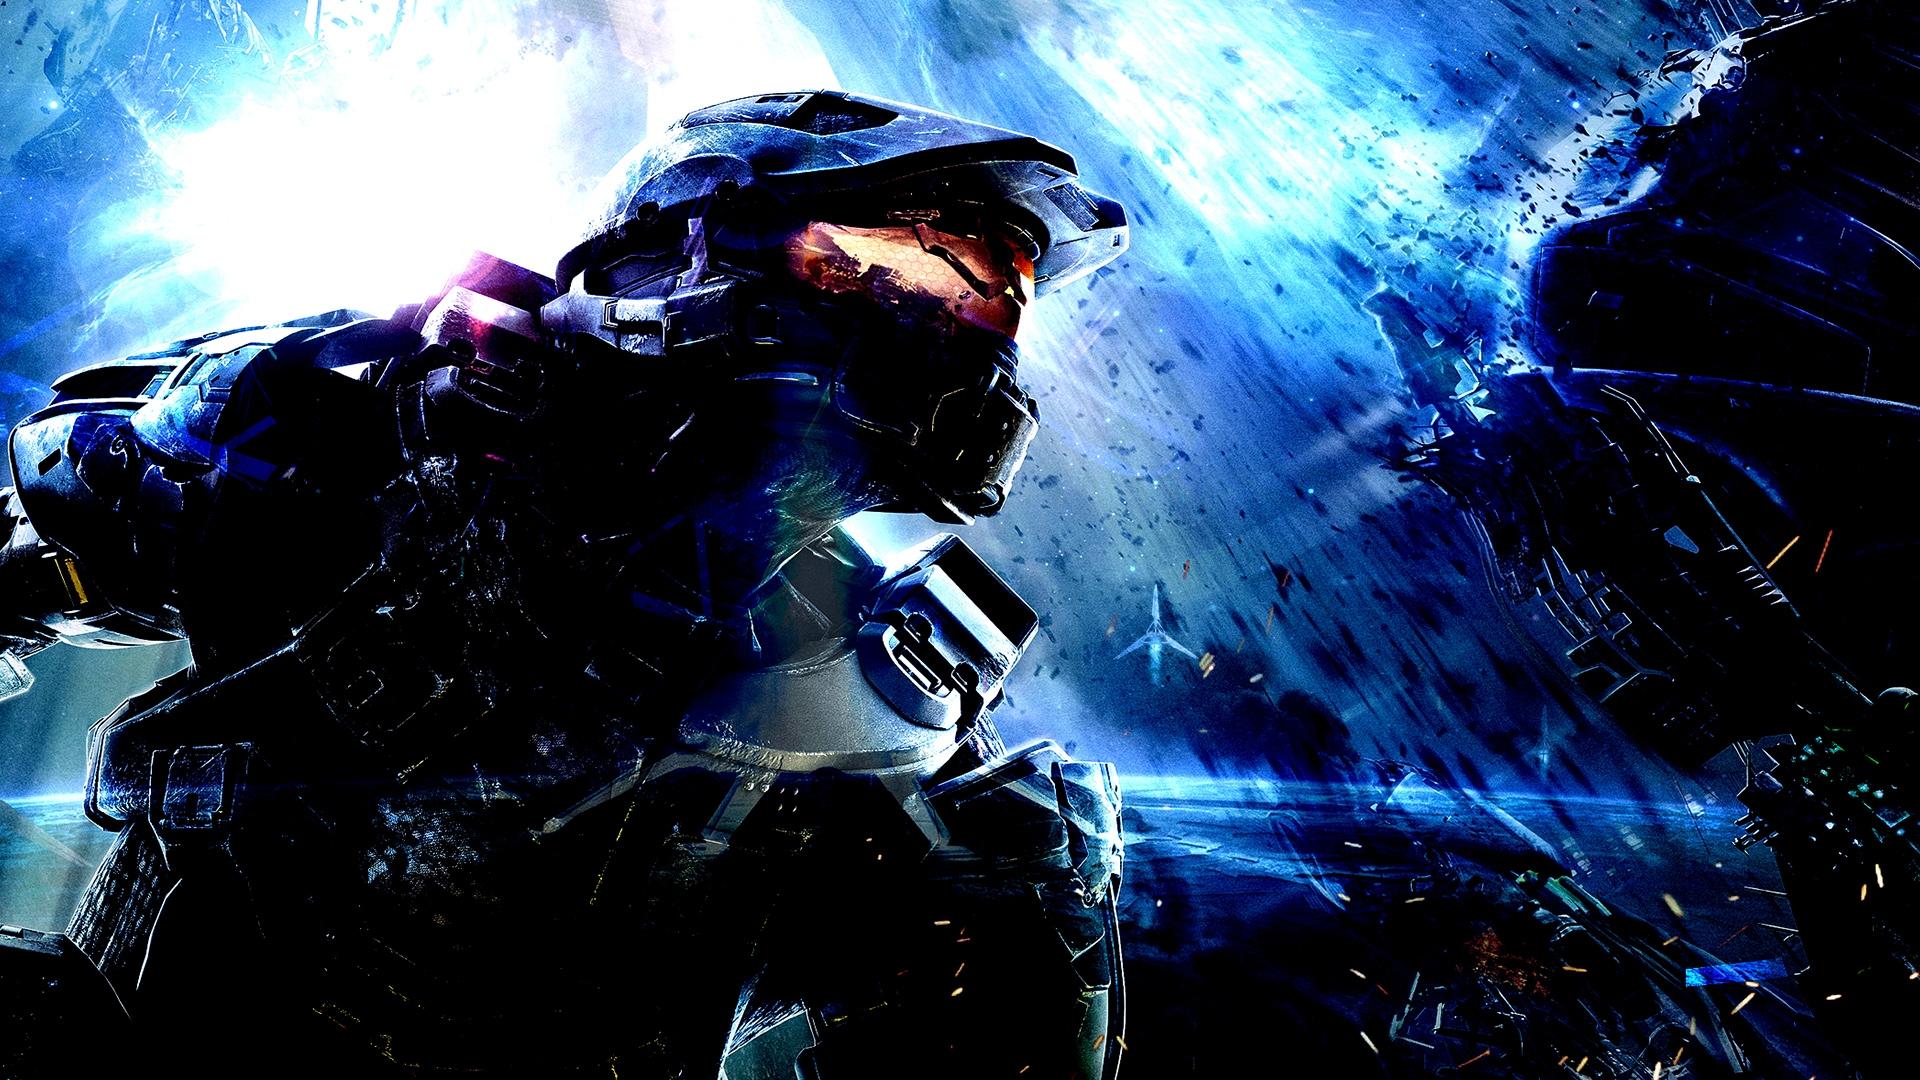 Halo 4 E3 Wallpaper - Wallpaper Pictures Gallery